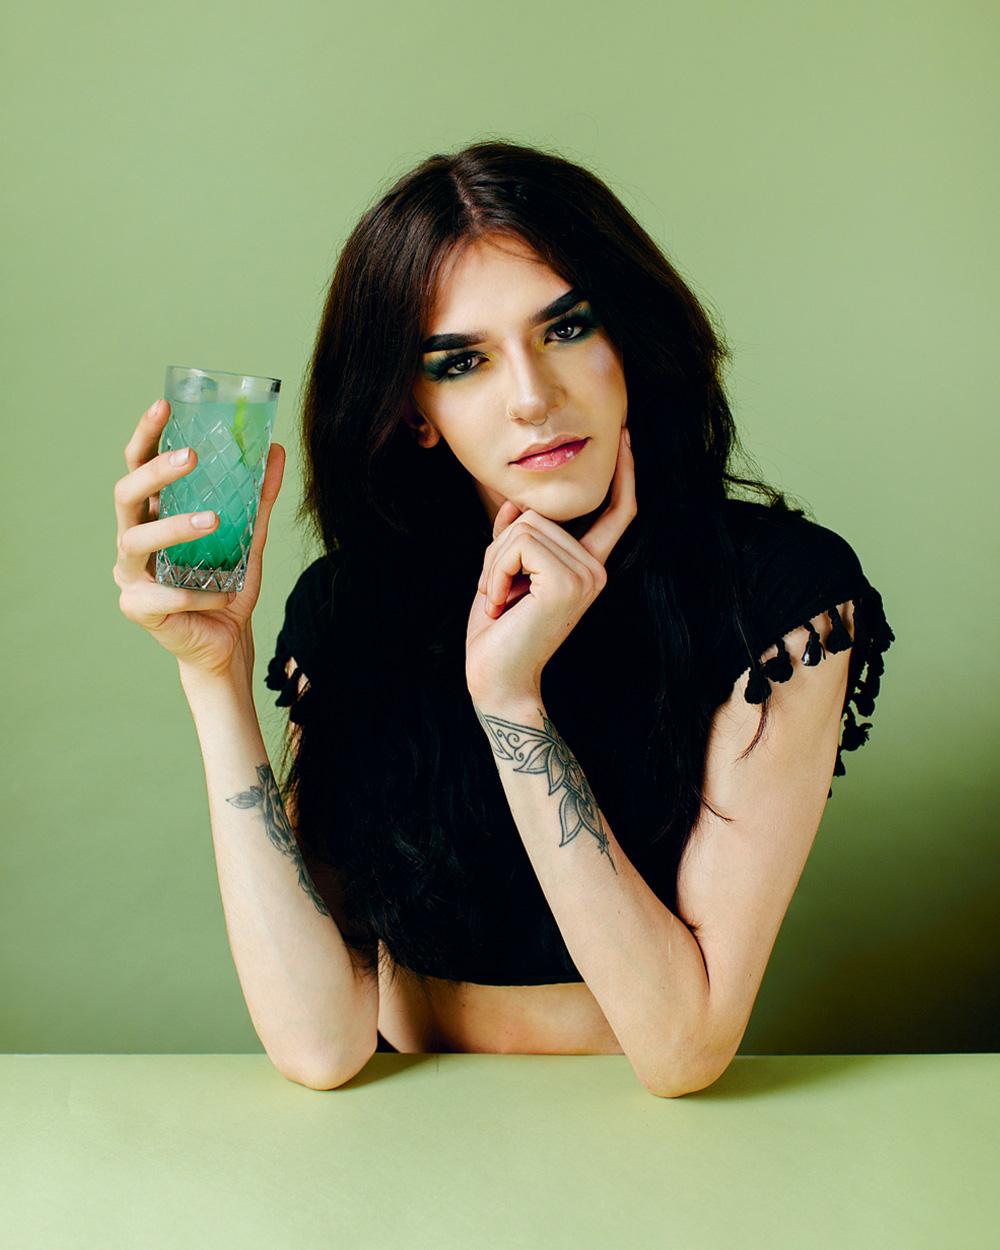 Jade Jones,    @jadeyaofficial     Occupation:  Hospitality, Makeup   Go-to cocktail:  Raspberry Absolut, Cola, & Lime